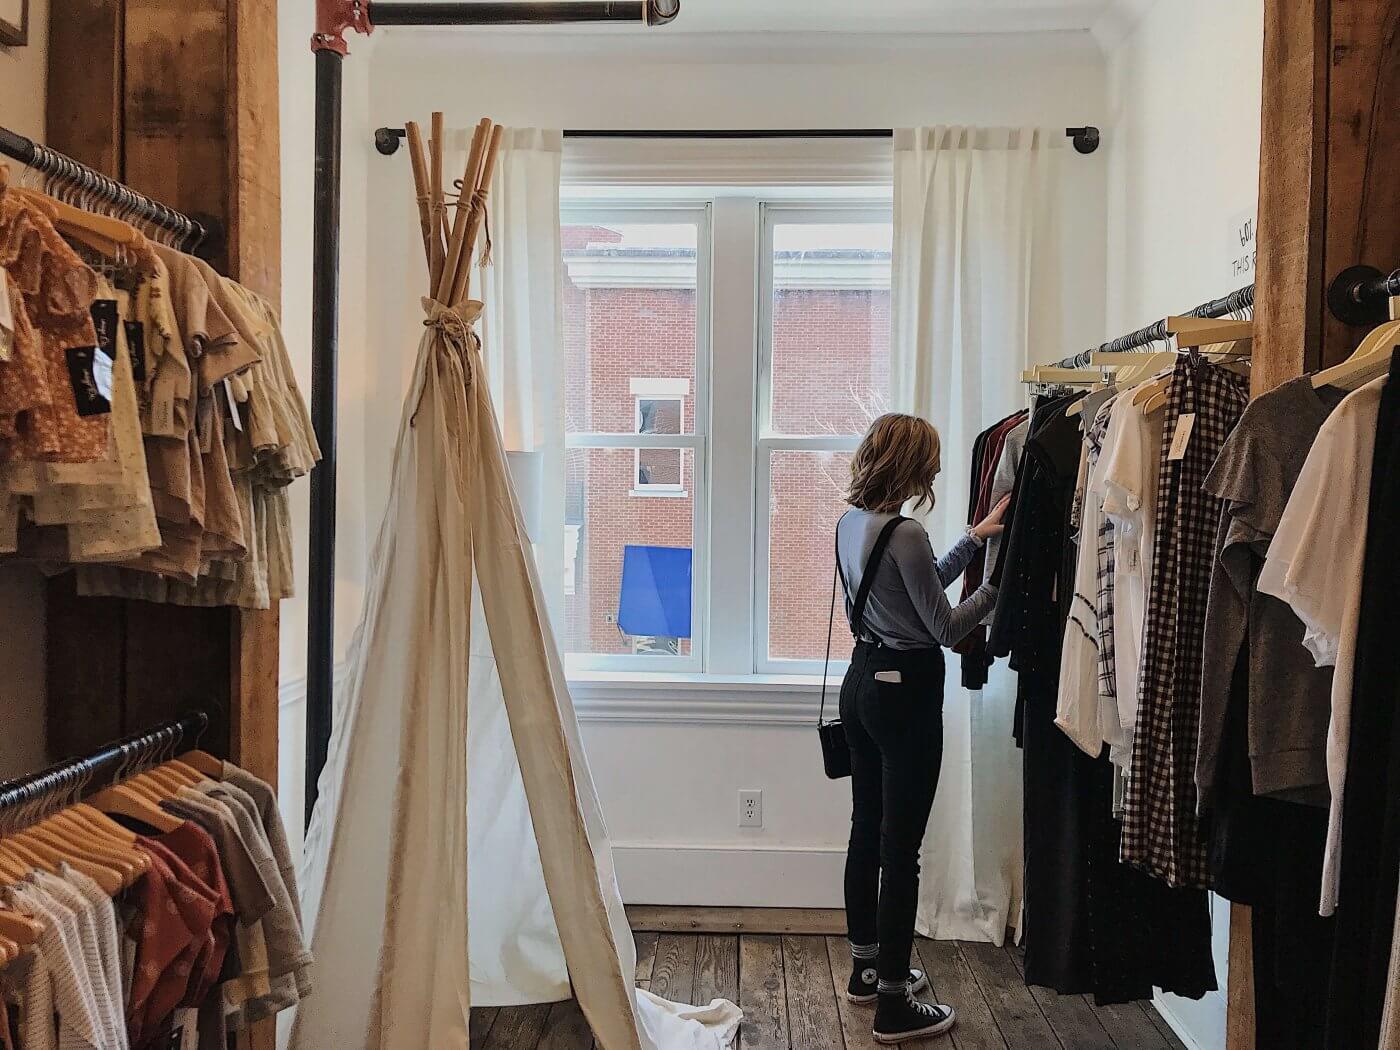 Women Shopping | The Mustcard